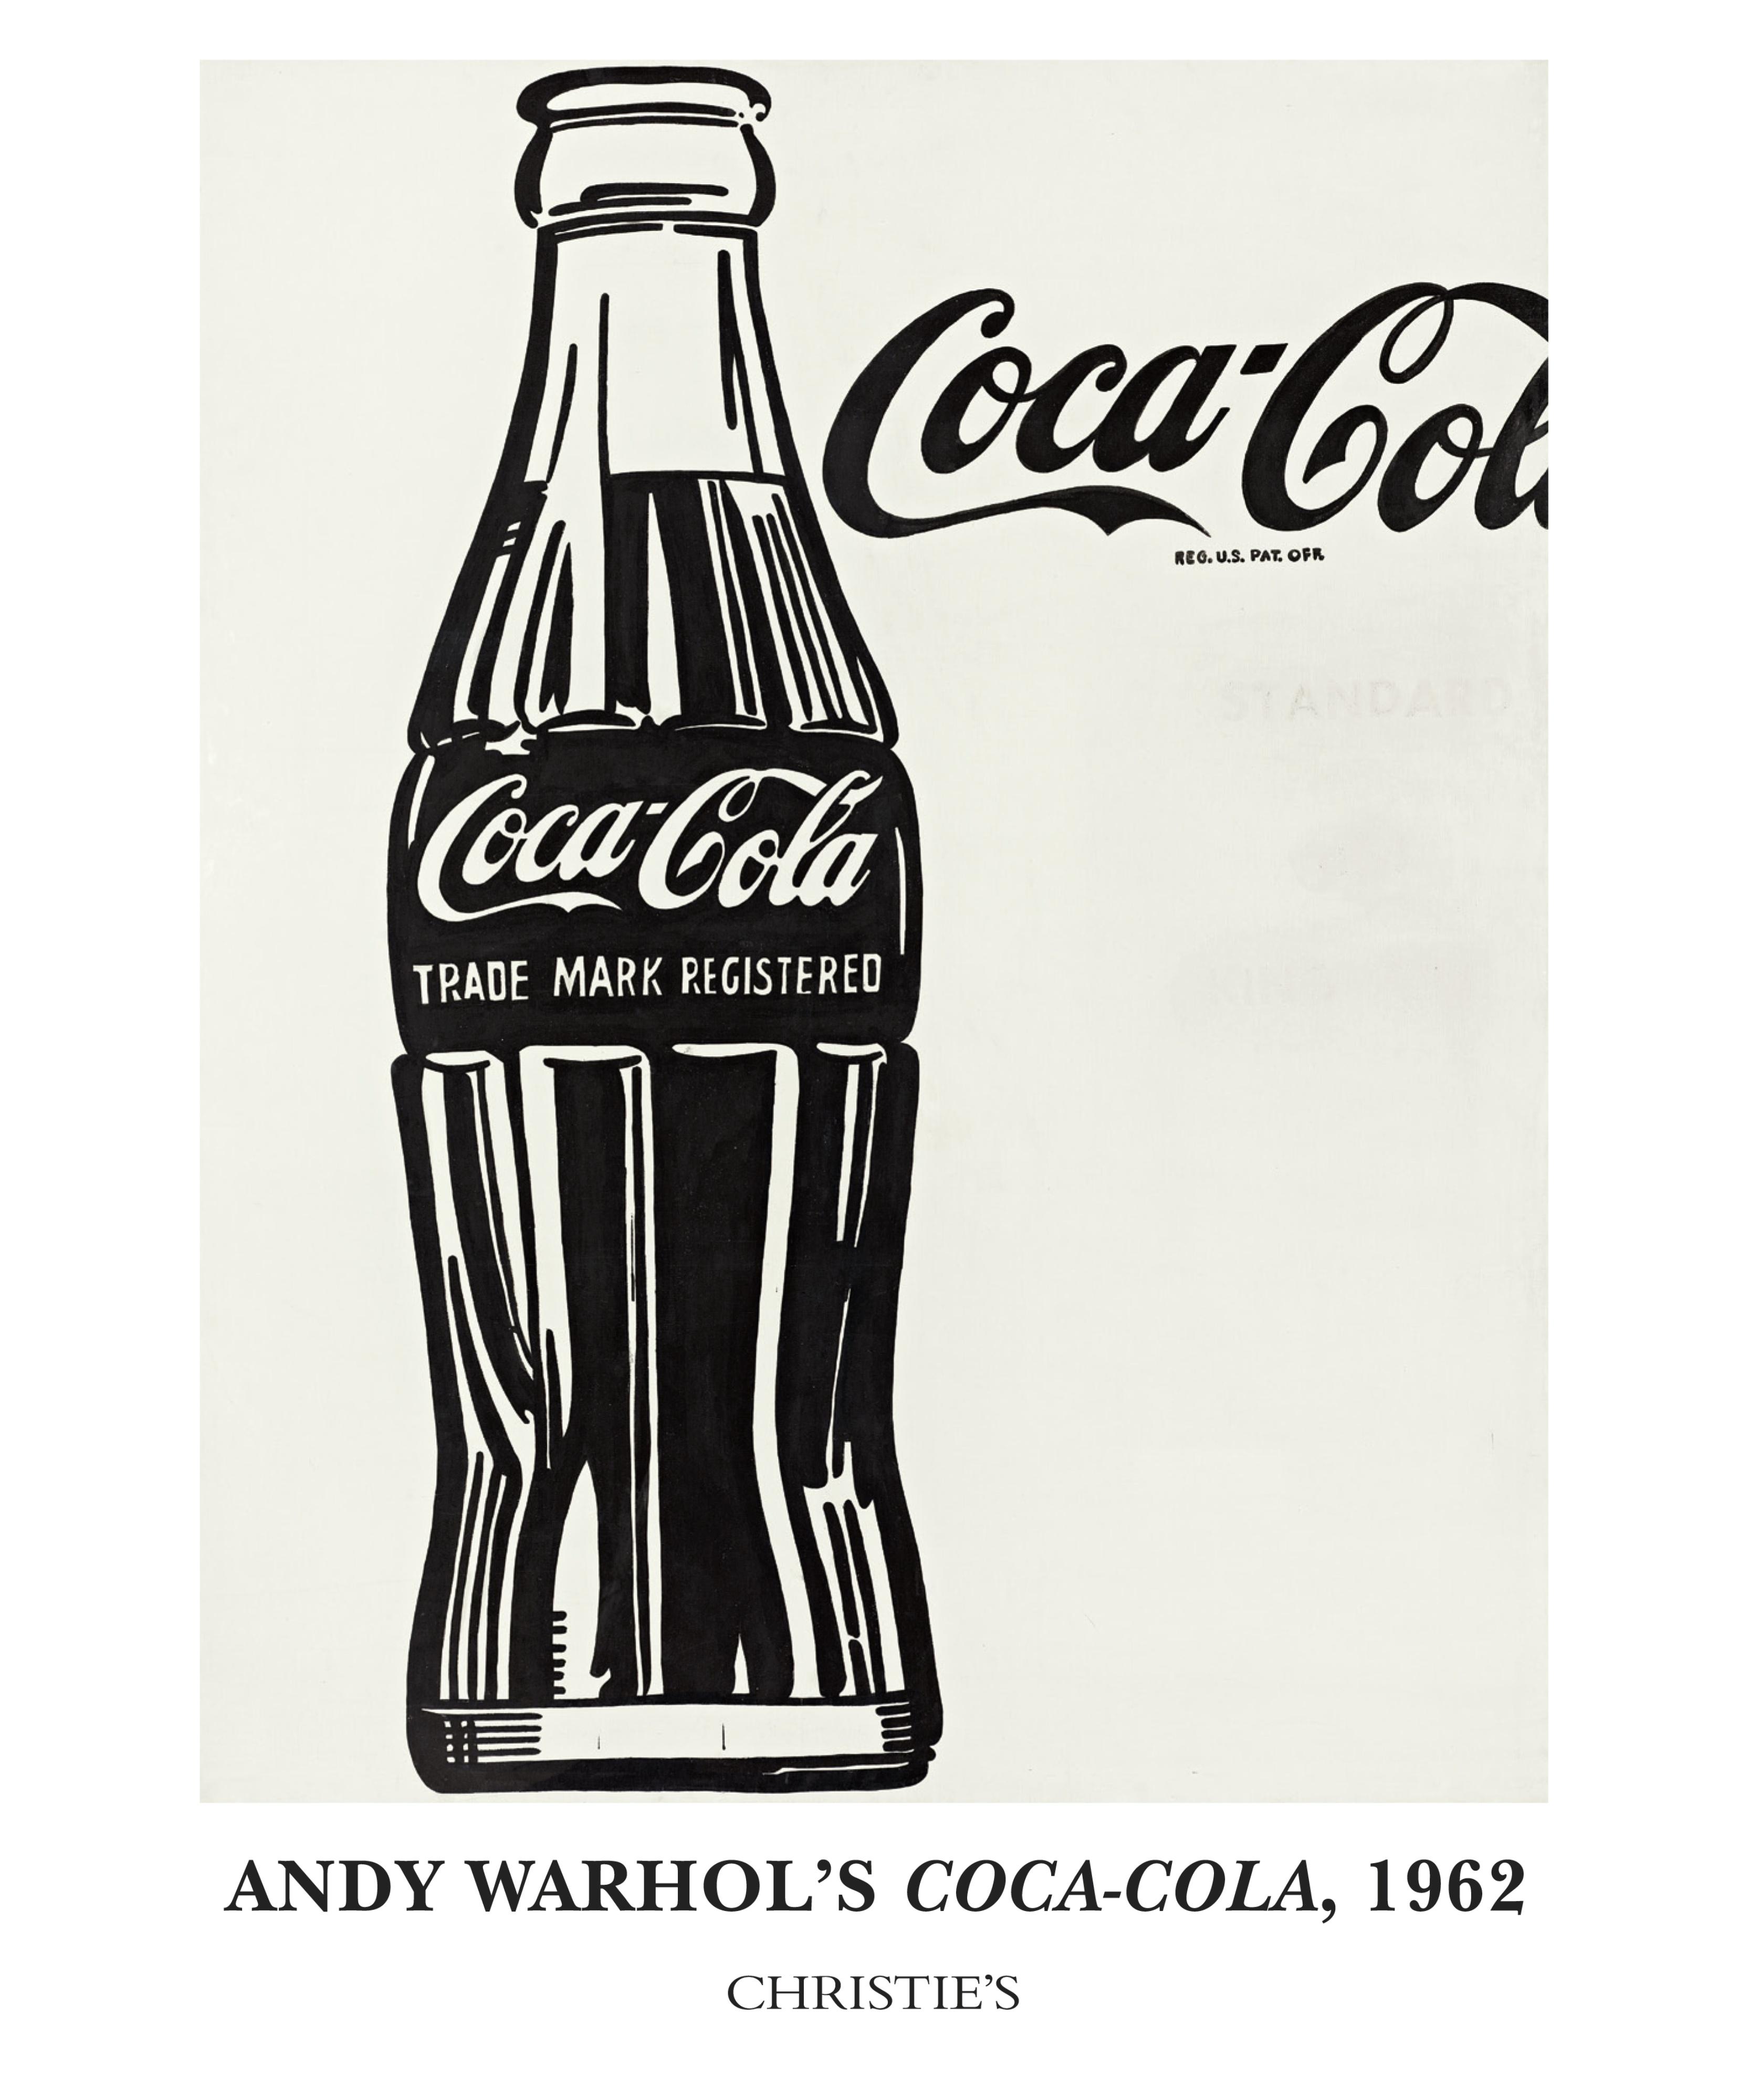 andy warhol pop art coca cola - photo #4